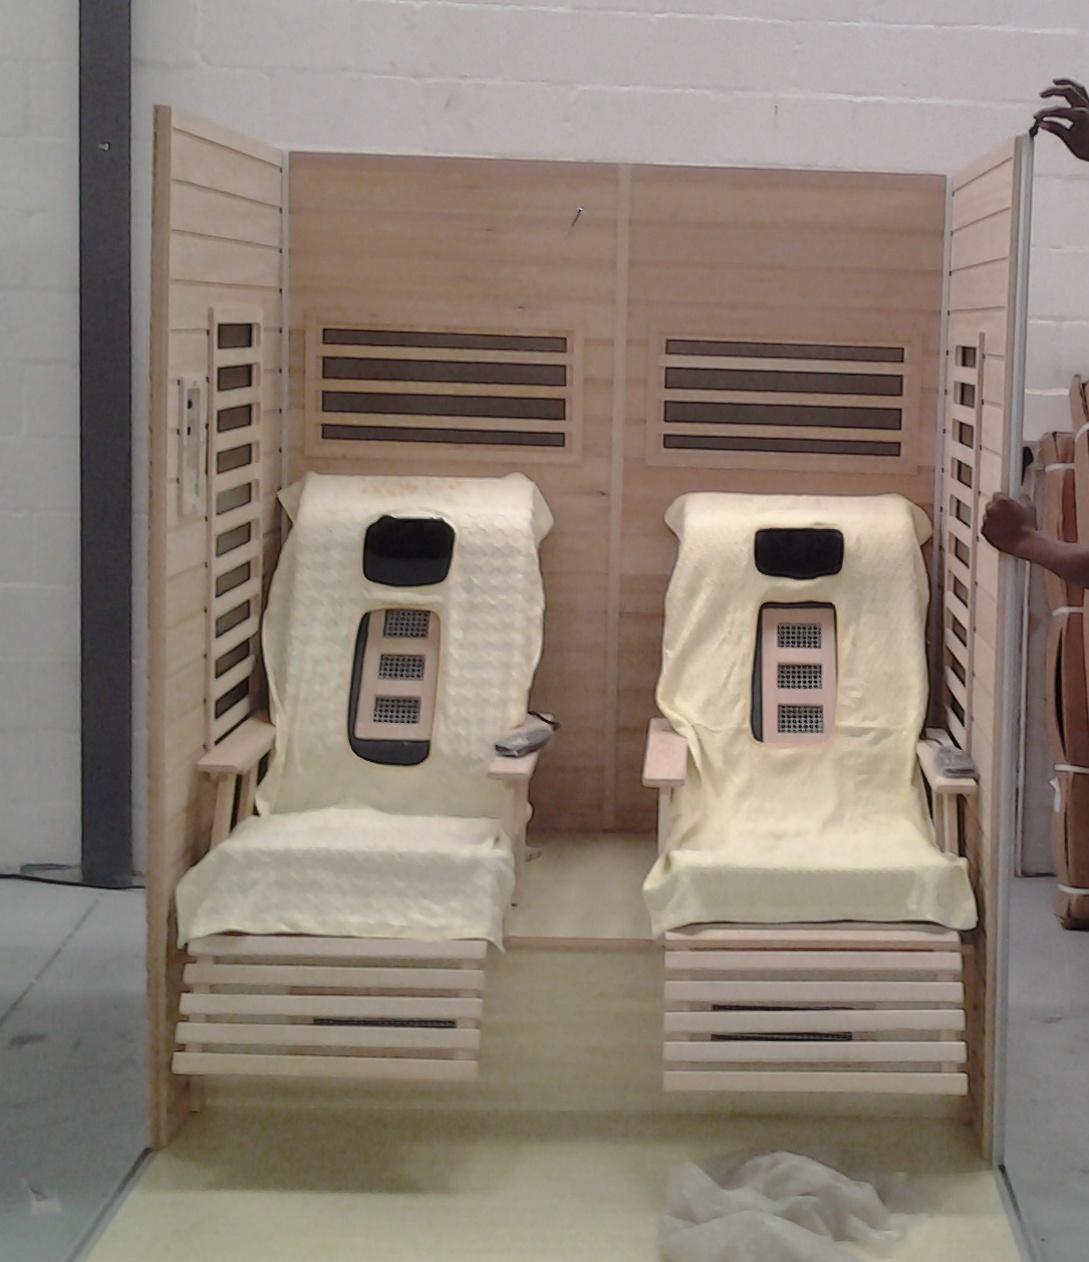 Halogen Light Vs Led >> Luxury Massage Sauna | SAUNA TECH